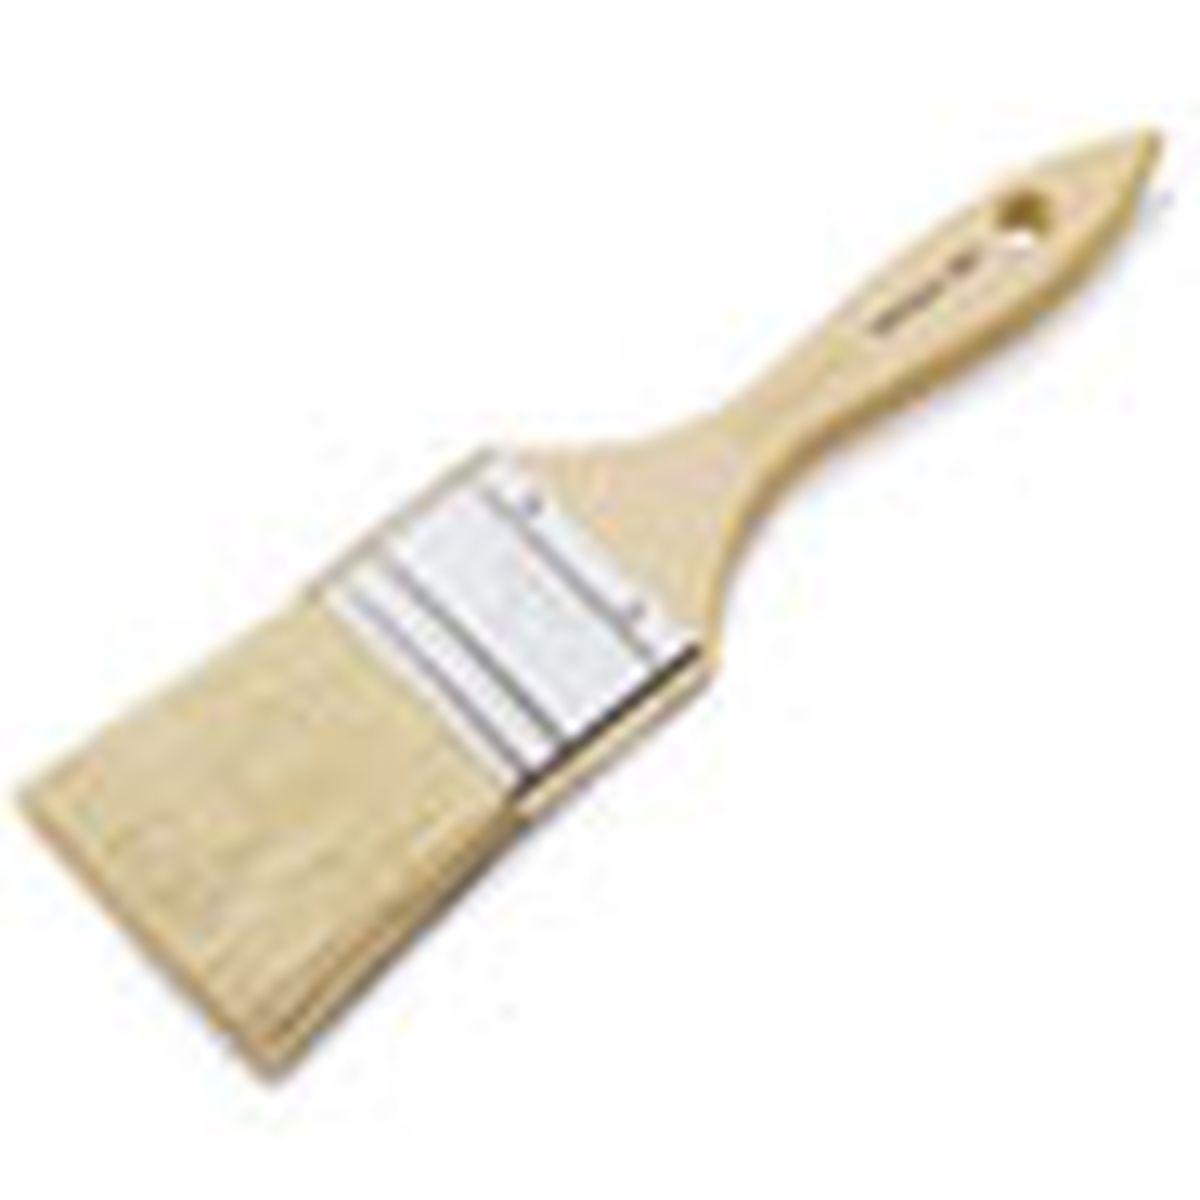 Natural-bristle chip brush